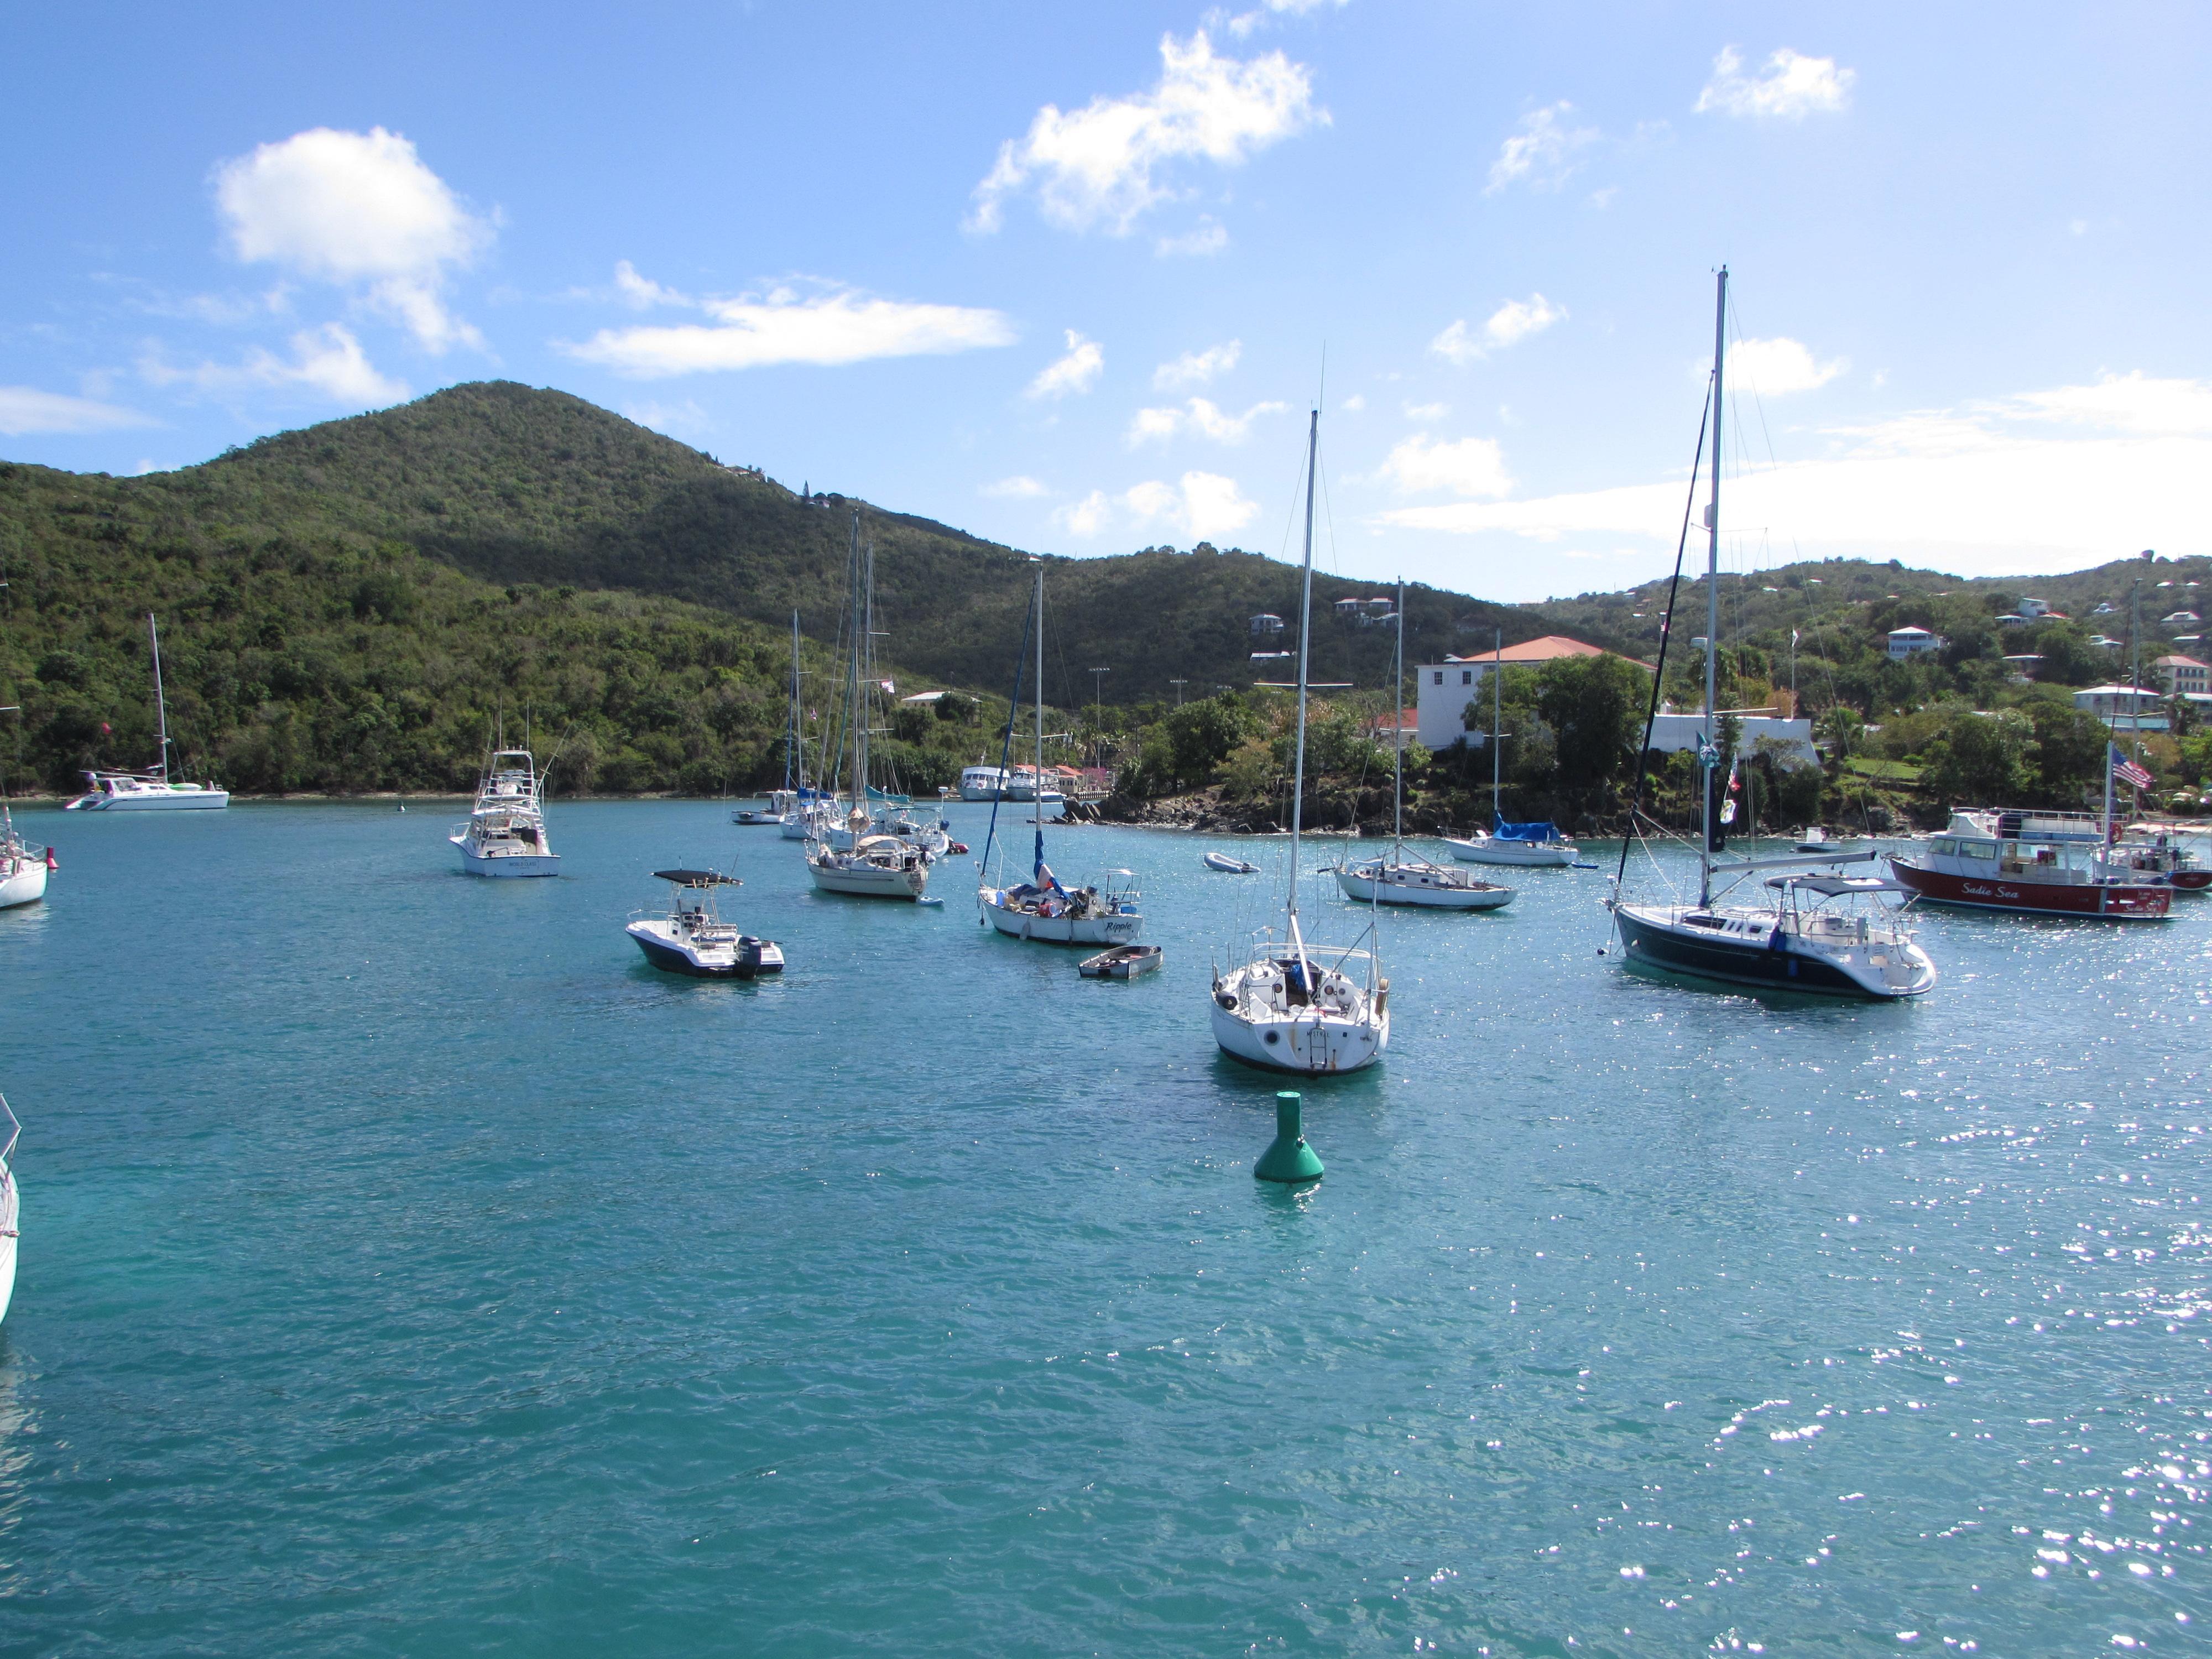 Approaching St. John via ferry